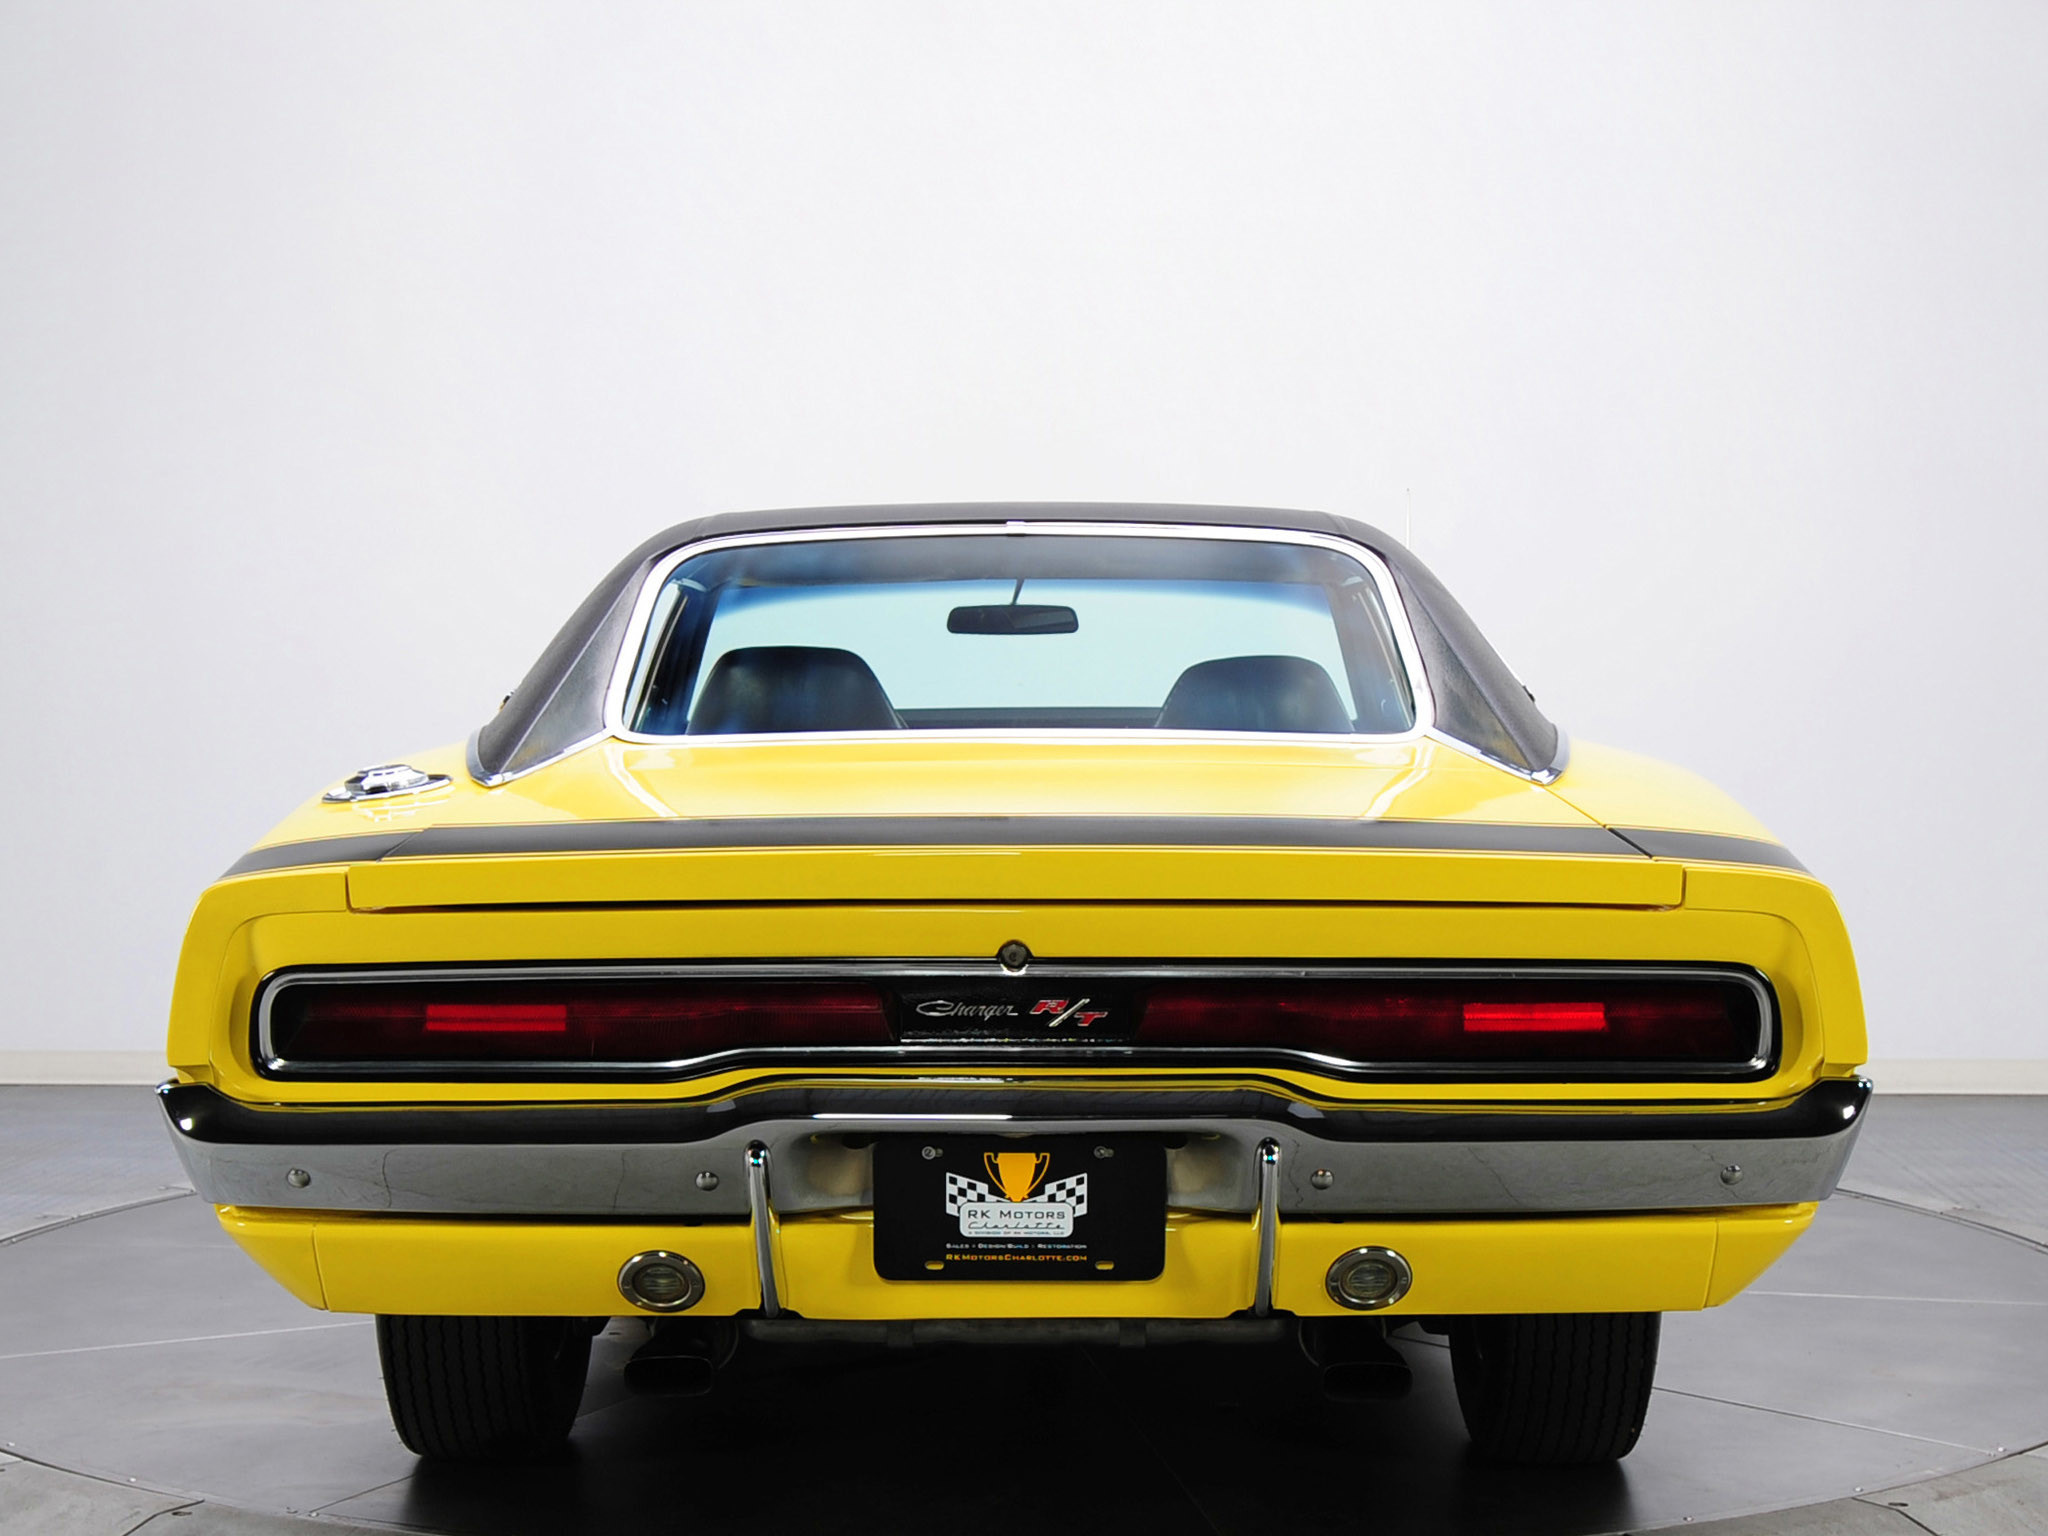 Dodge-Charger-RT-426-Hemi-1970-Wallpaper